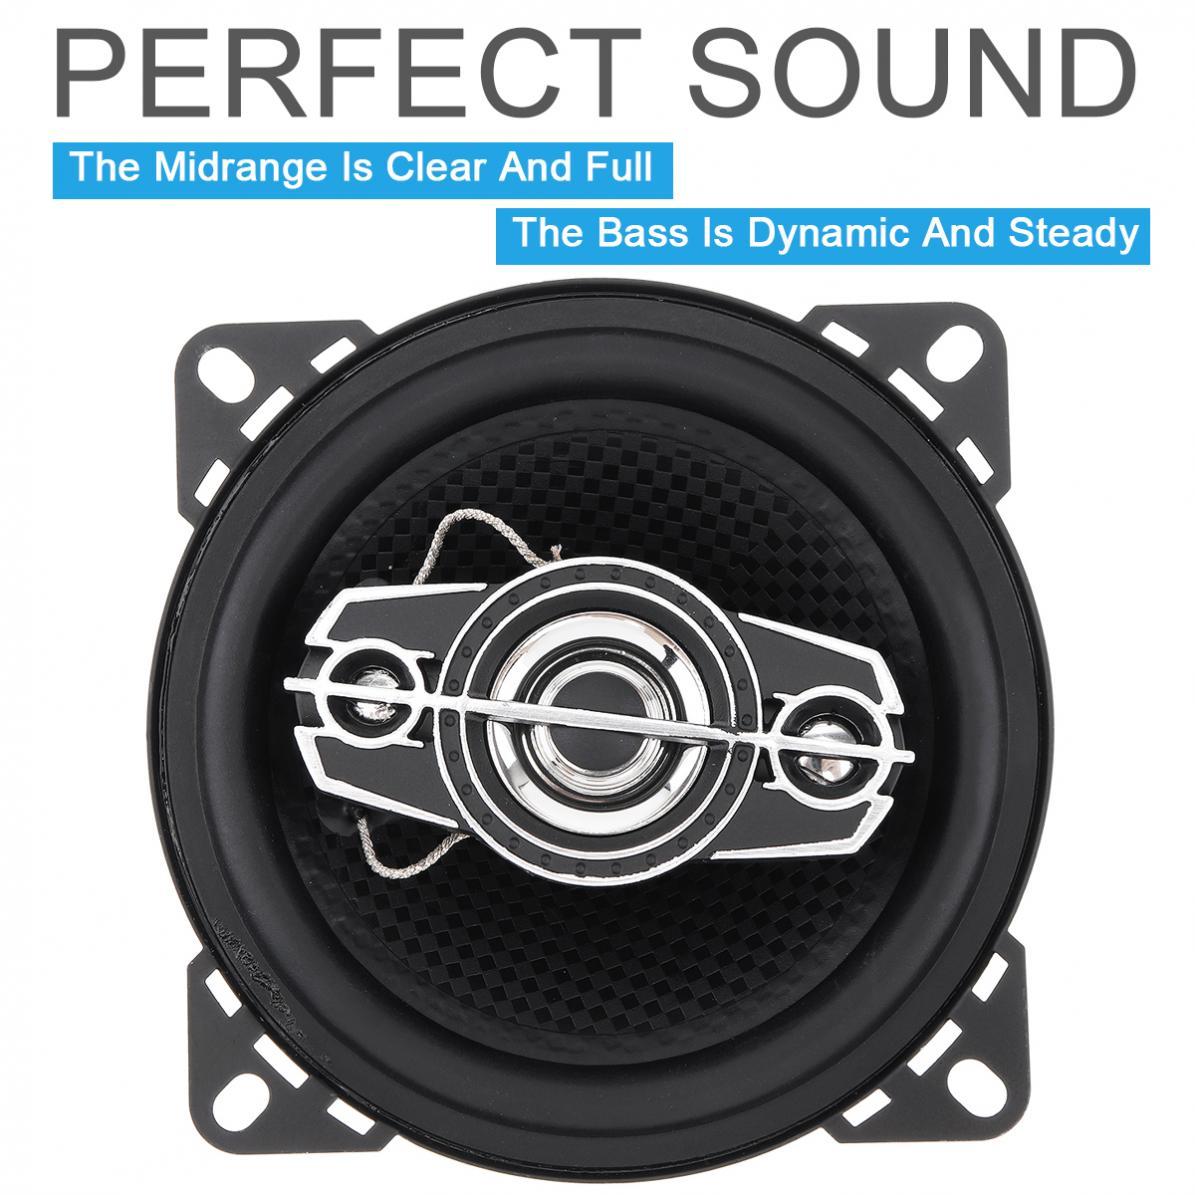 2pcs 4 Inch 10cm 250W Car Coaxial Speakers Auto Audio Music Stereo Full Range Frequency Hifi Non-destructive Installation